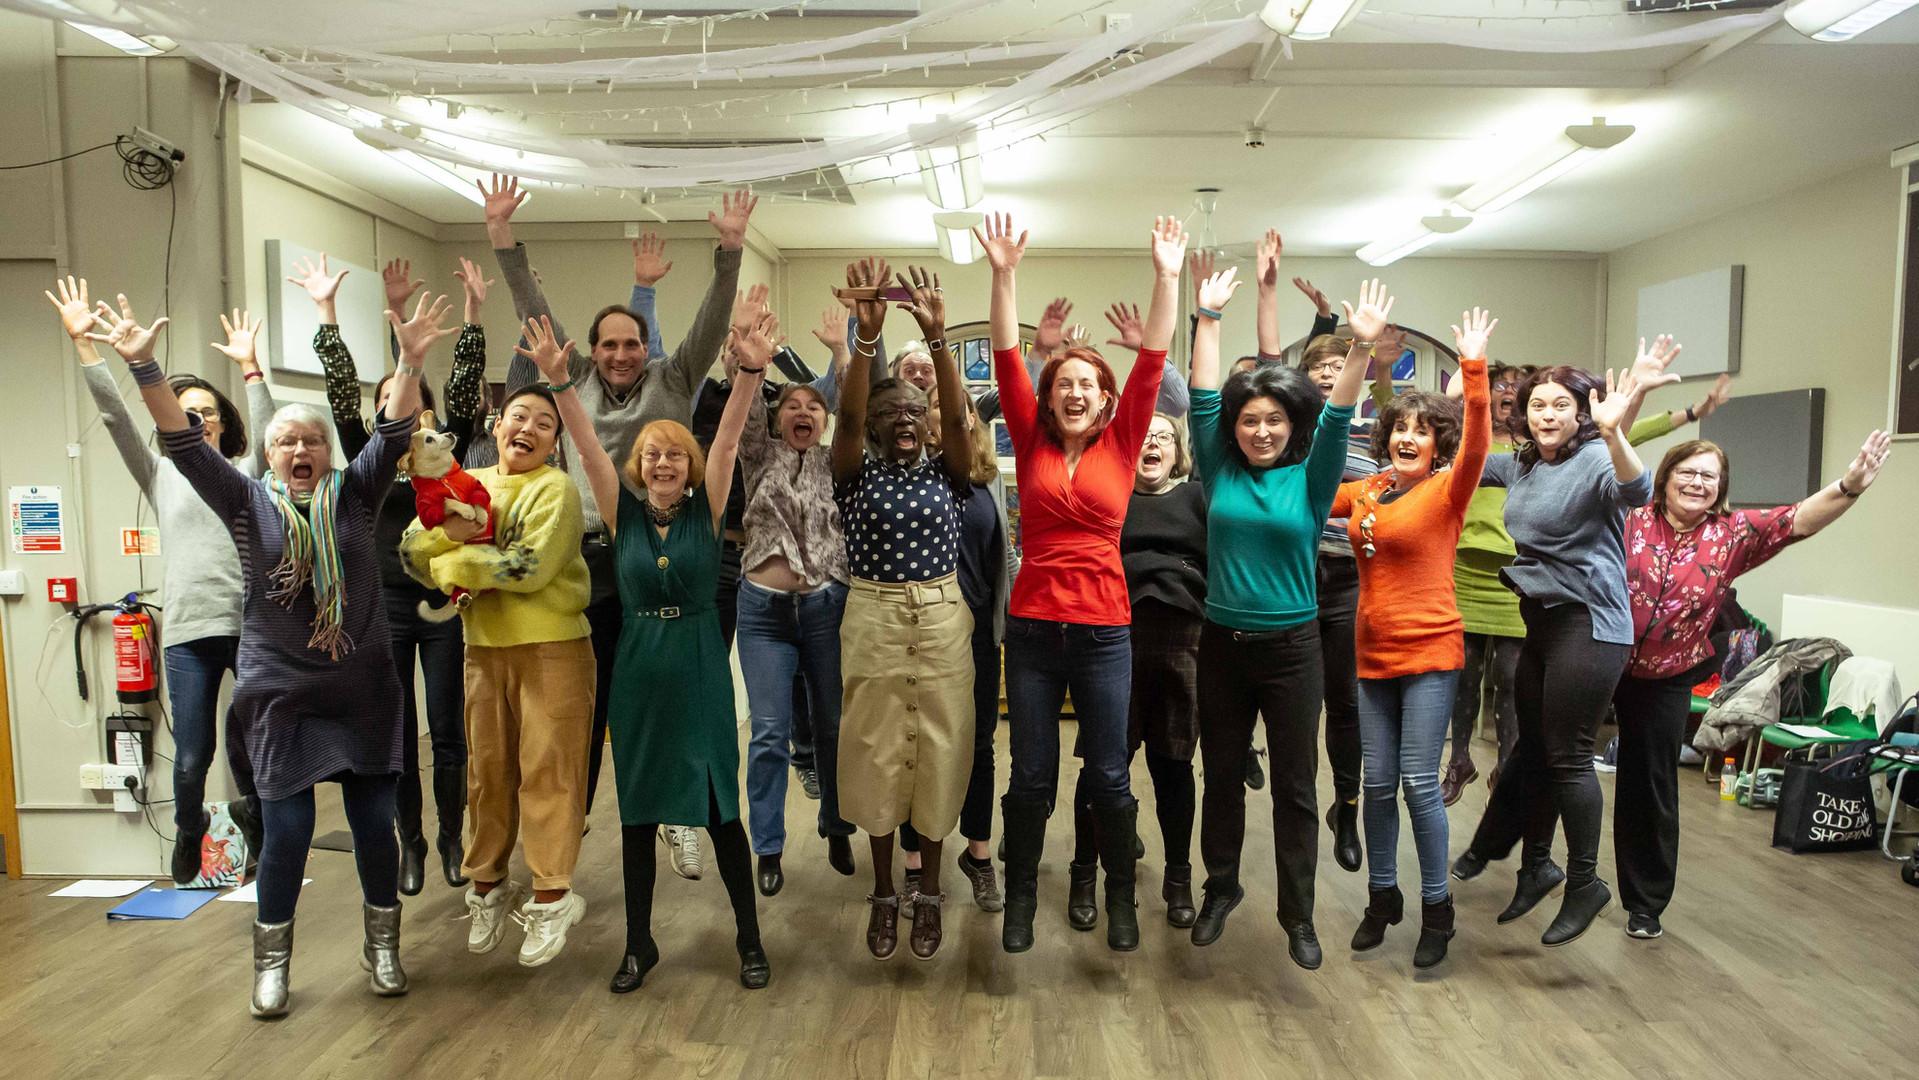 Palace Acappella Choir group photo. Credit Harry Livingstone.